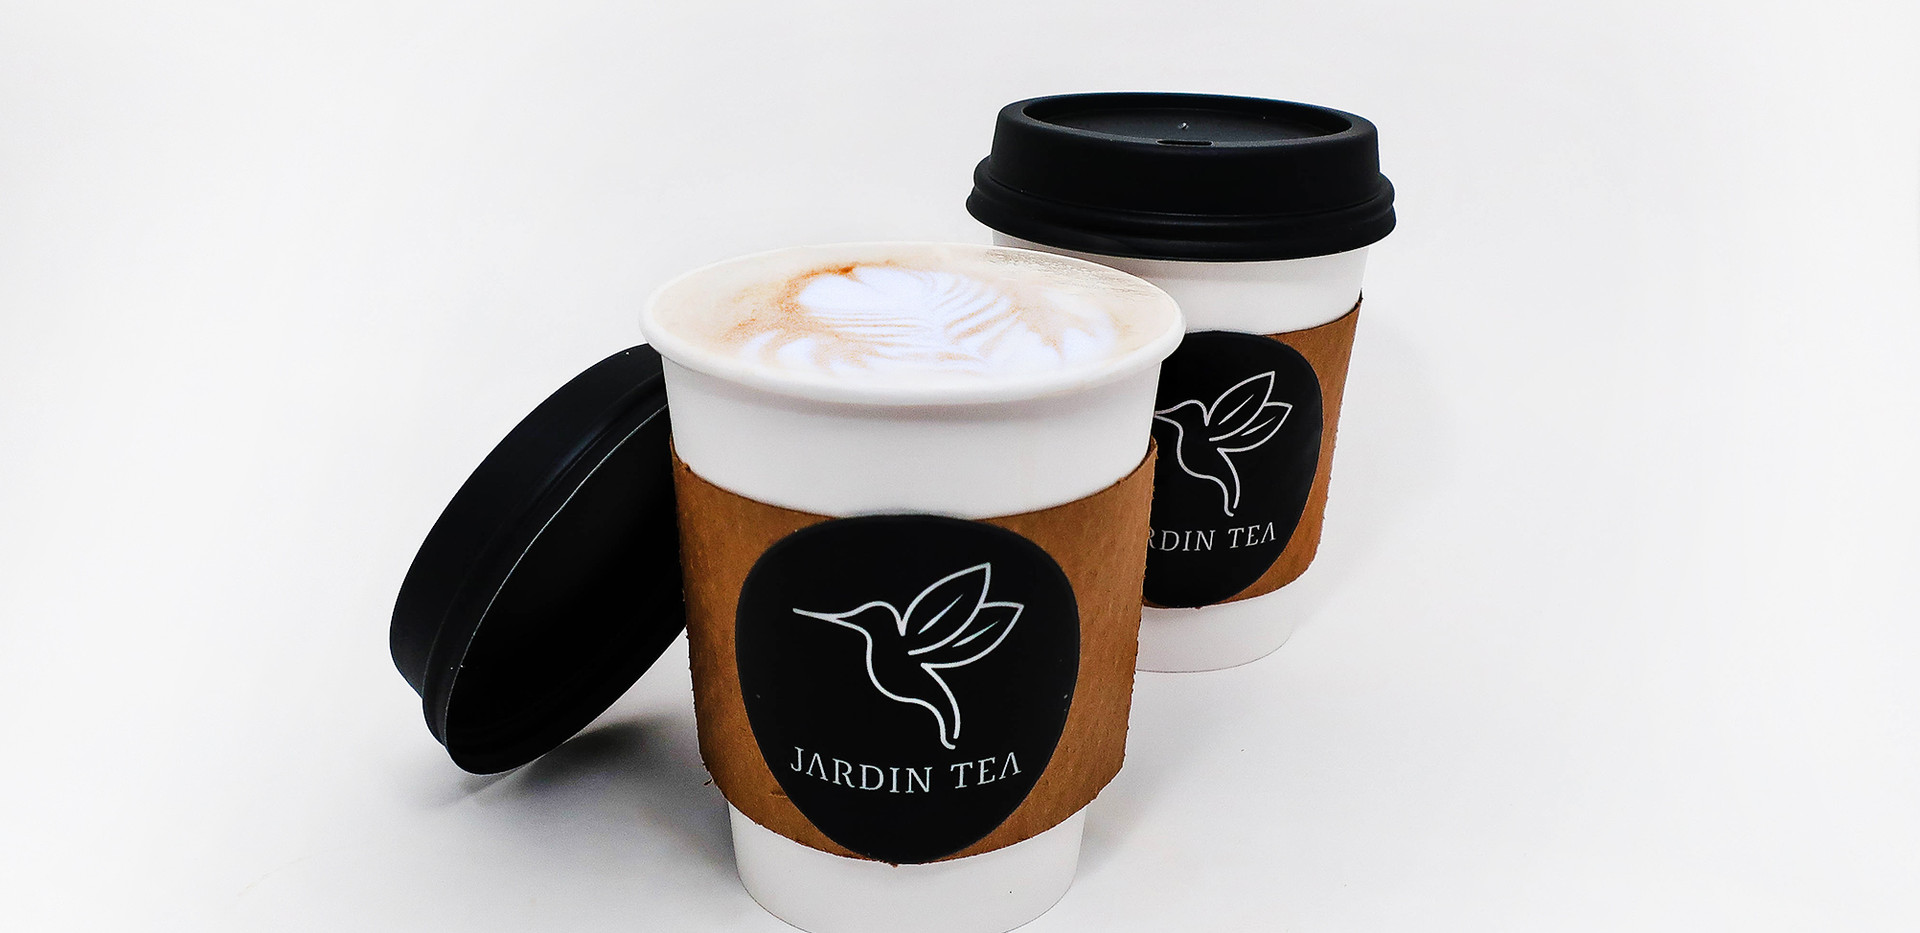 Jardin Tea Hot Coffee Latte